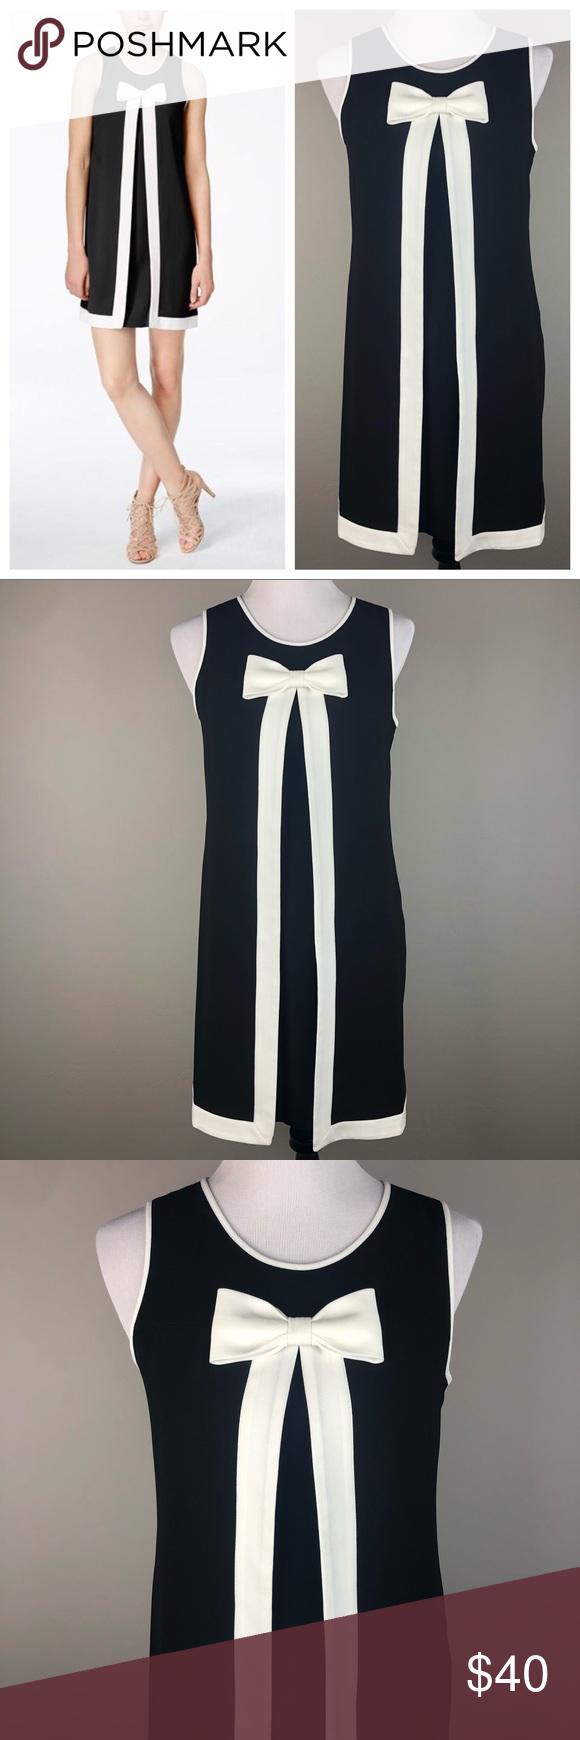 Cece Cynthia Steffe Bow Trim Shift Dress 6 Shift Dress Sleeveless Shift Dress Cynthia Steffe